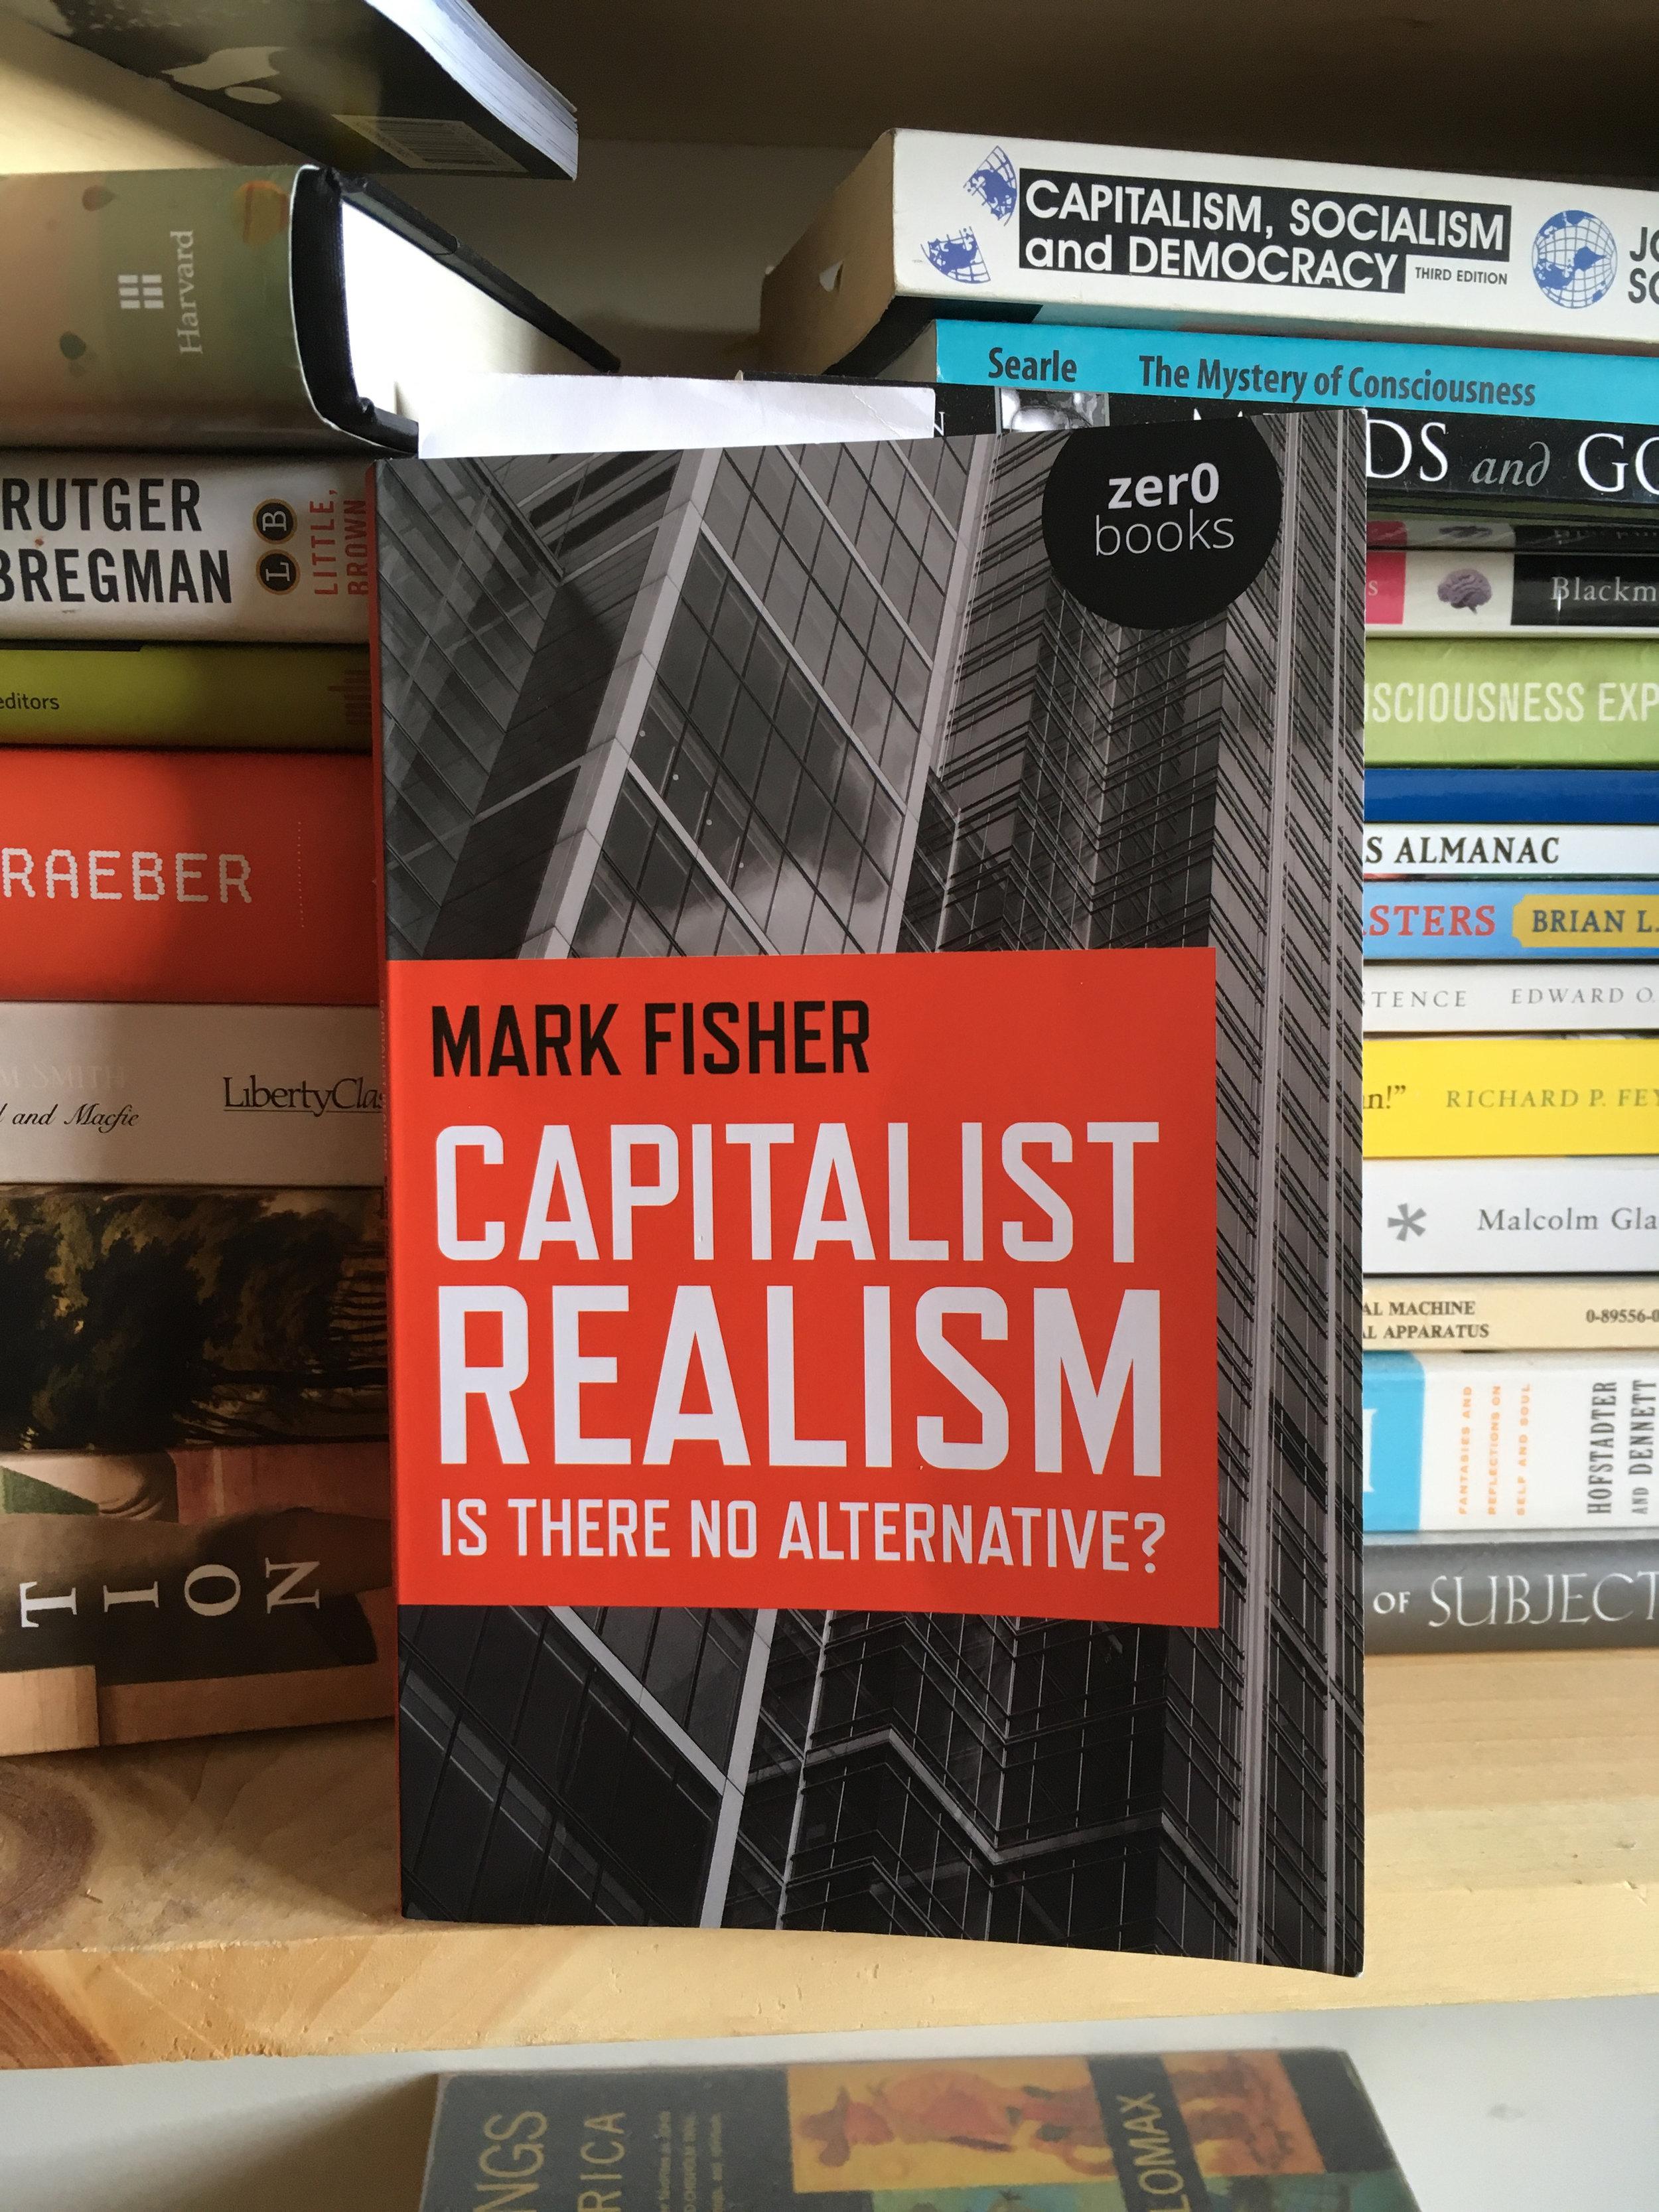 Capitalist Realism - Mark Fisher